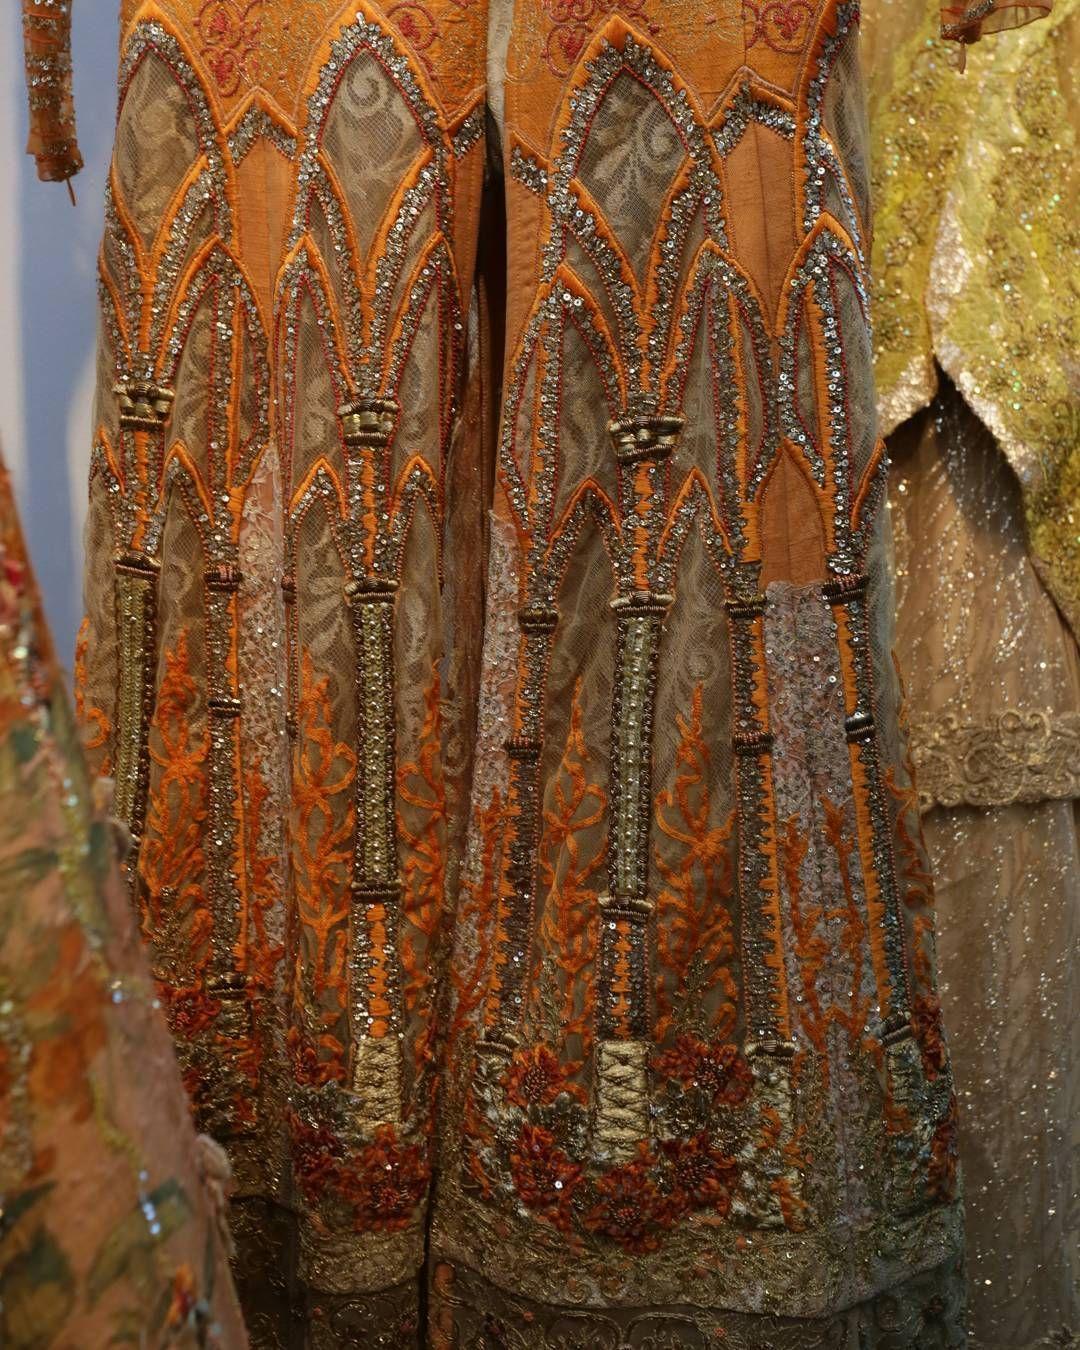 Lavish, royal orange with intricate, textured hand detailing ...